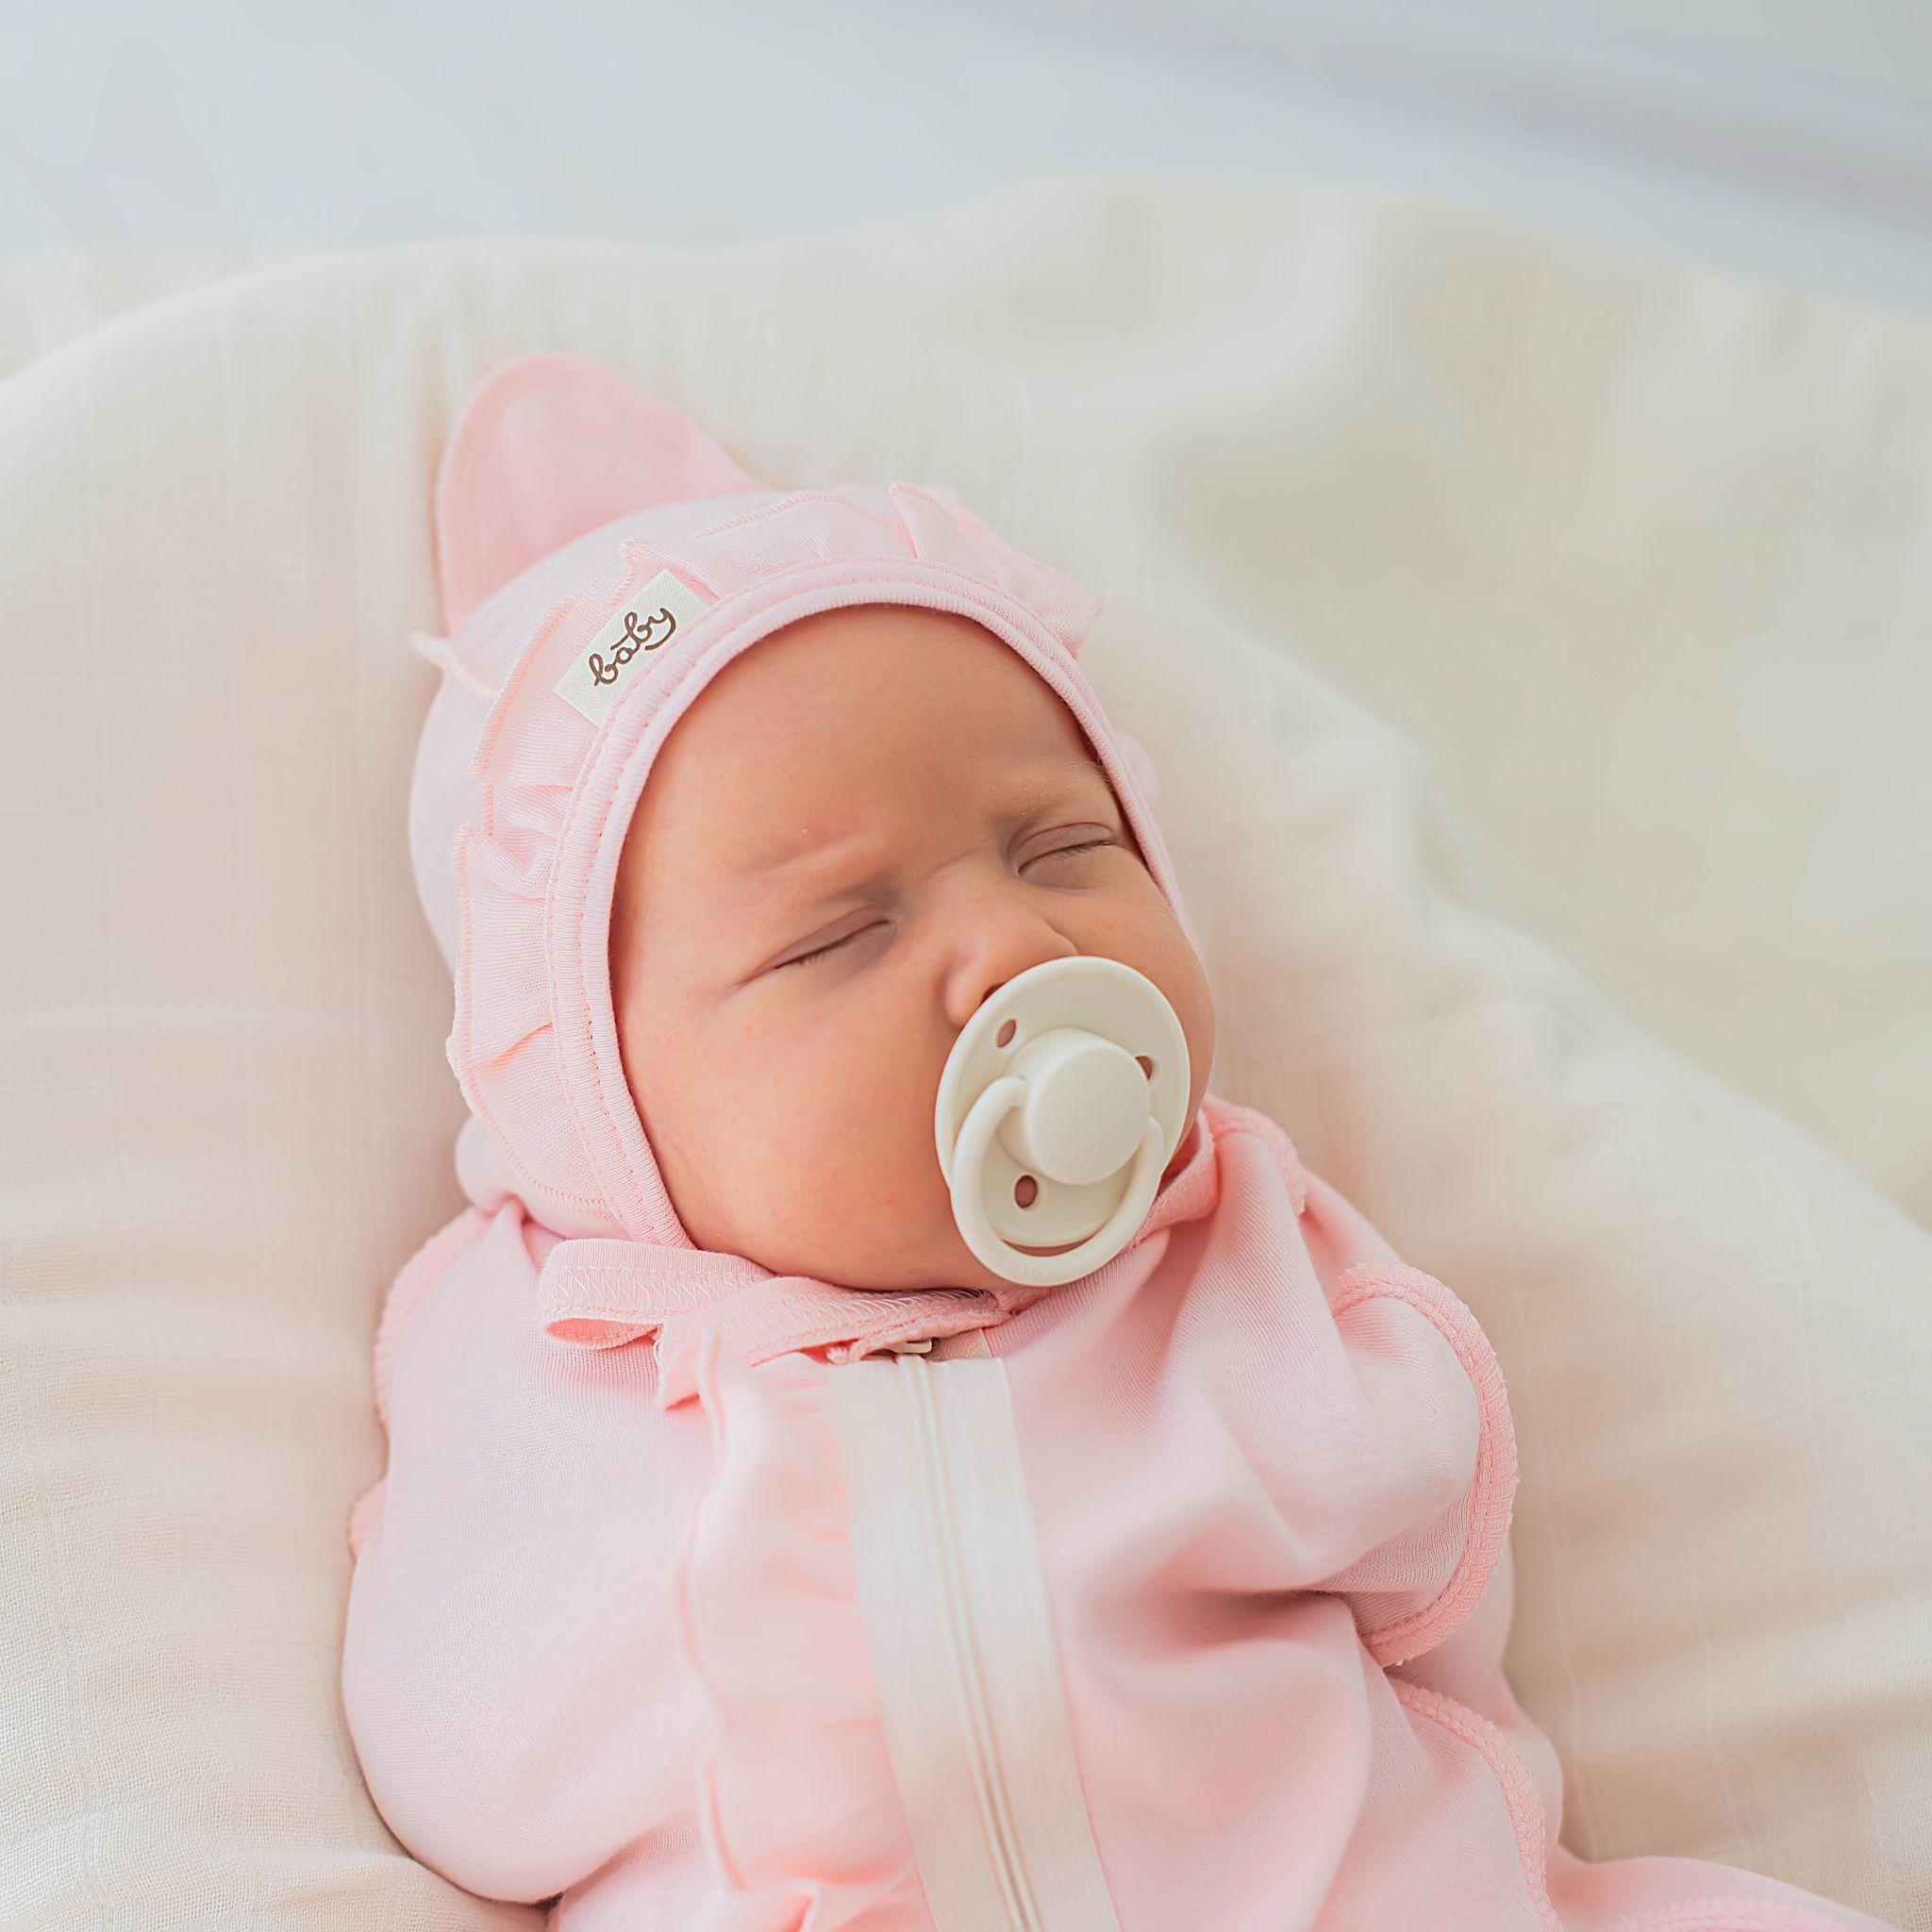 Ruffled baby hat 0+, Light Pink